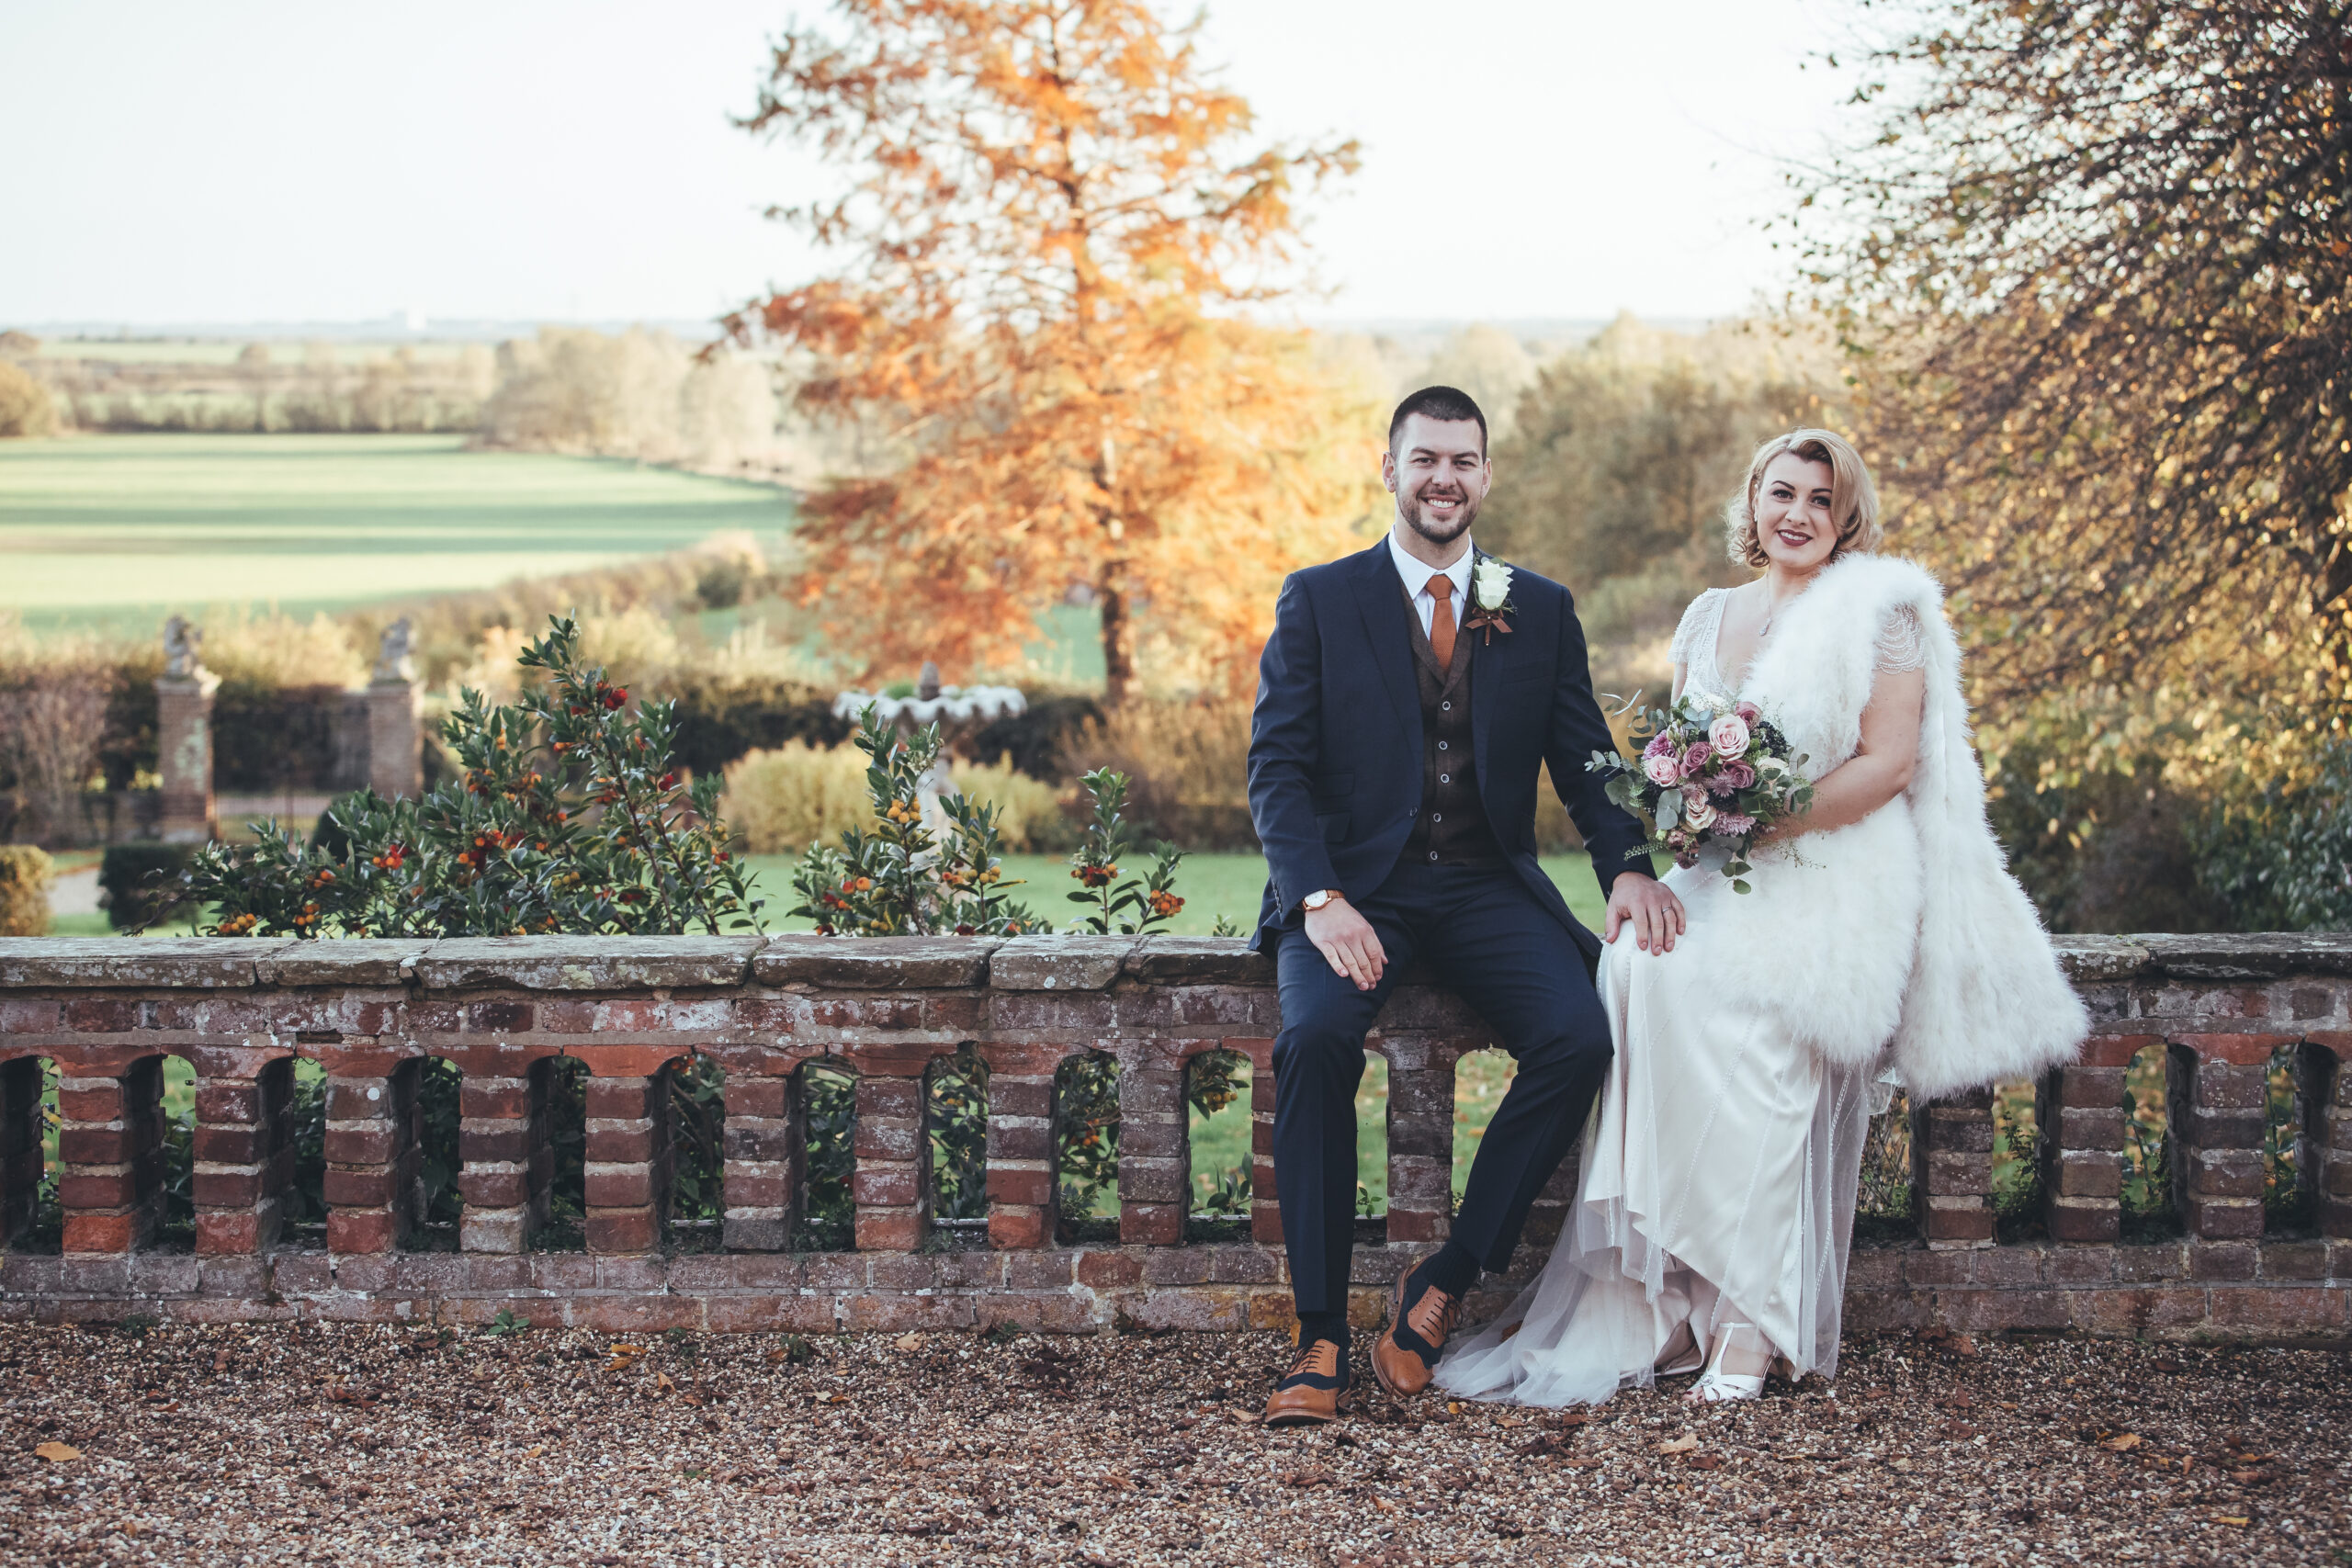 Bride and Groom, Autumn wedding garden photo